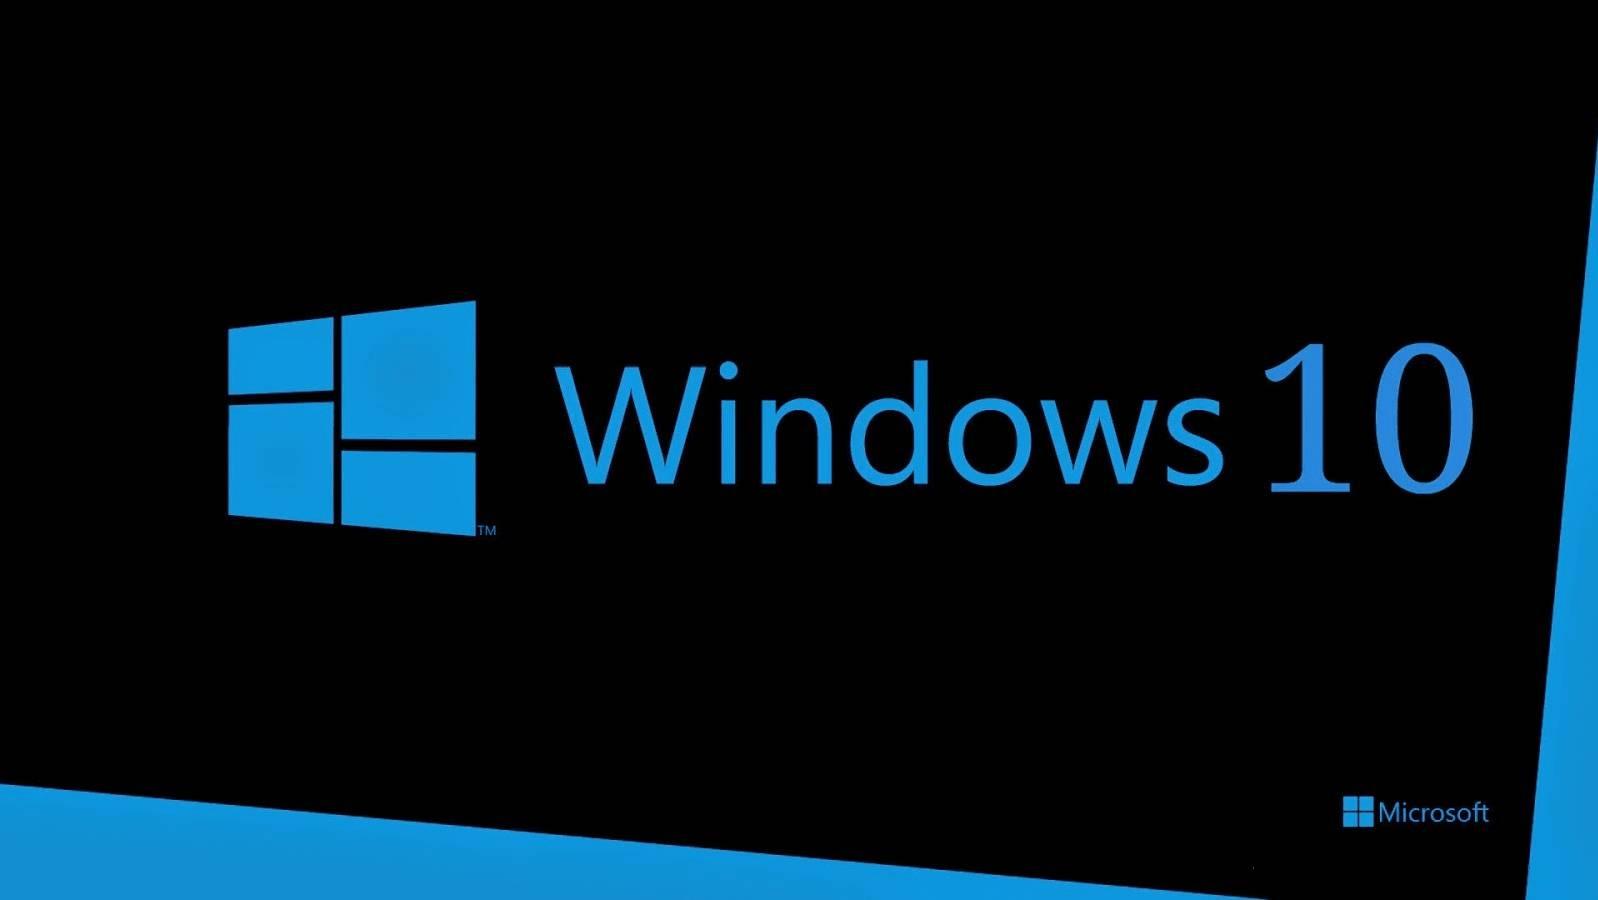 Windows 10 bing